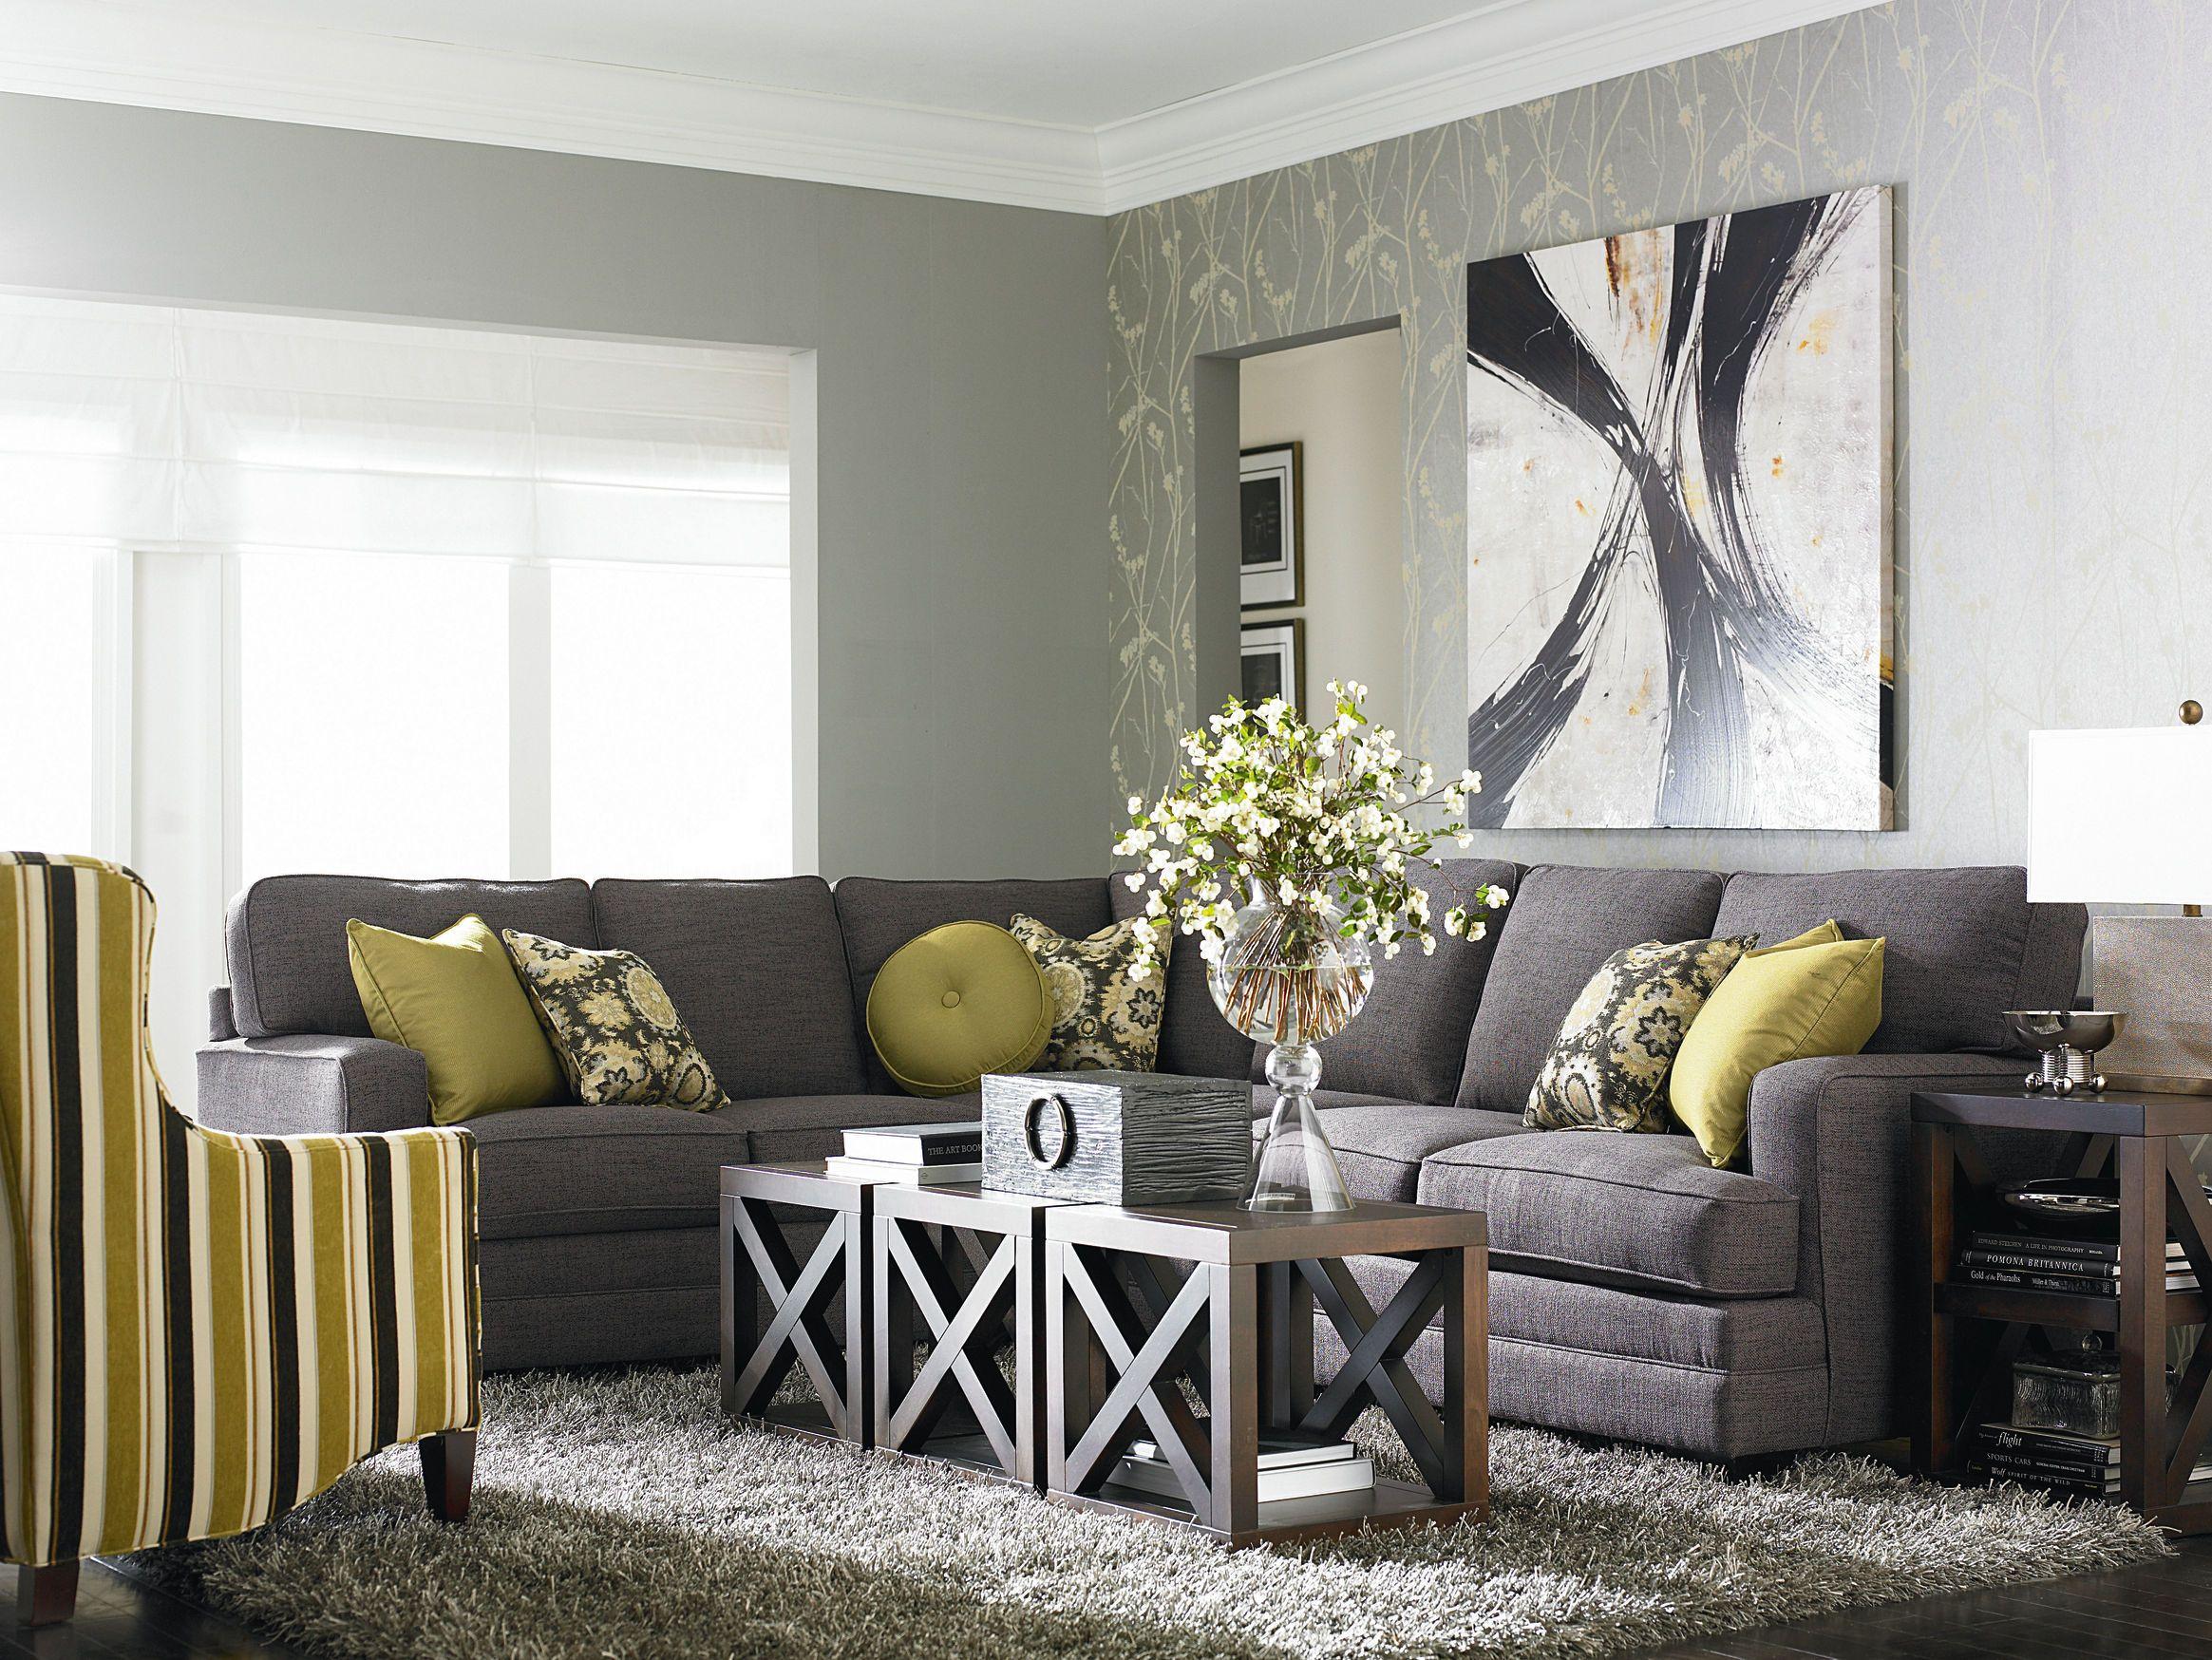 Re Create This Look At Bassett Furniture In Brick Nj Living